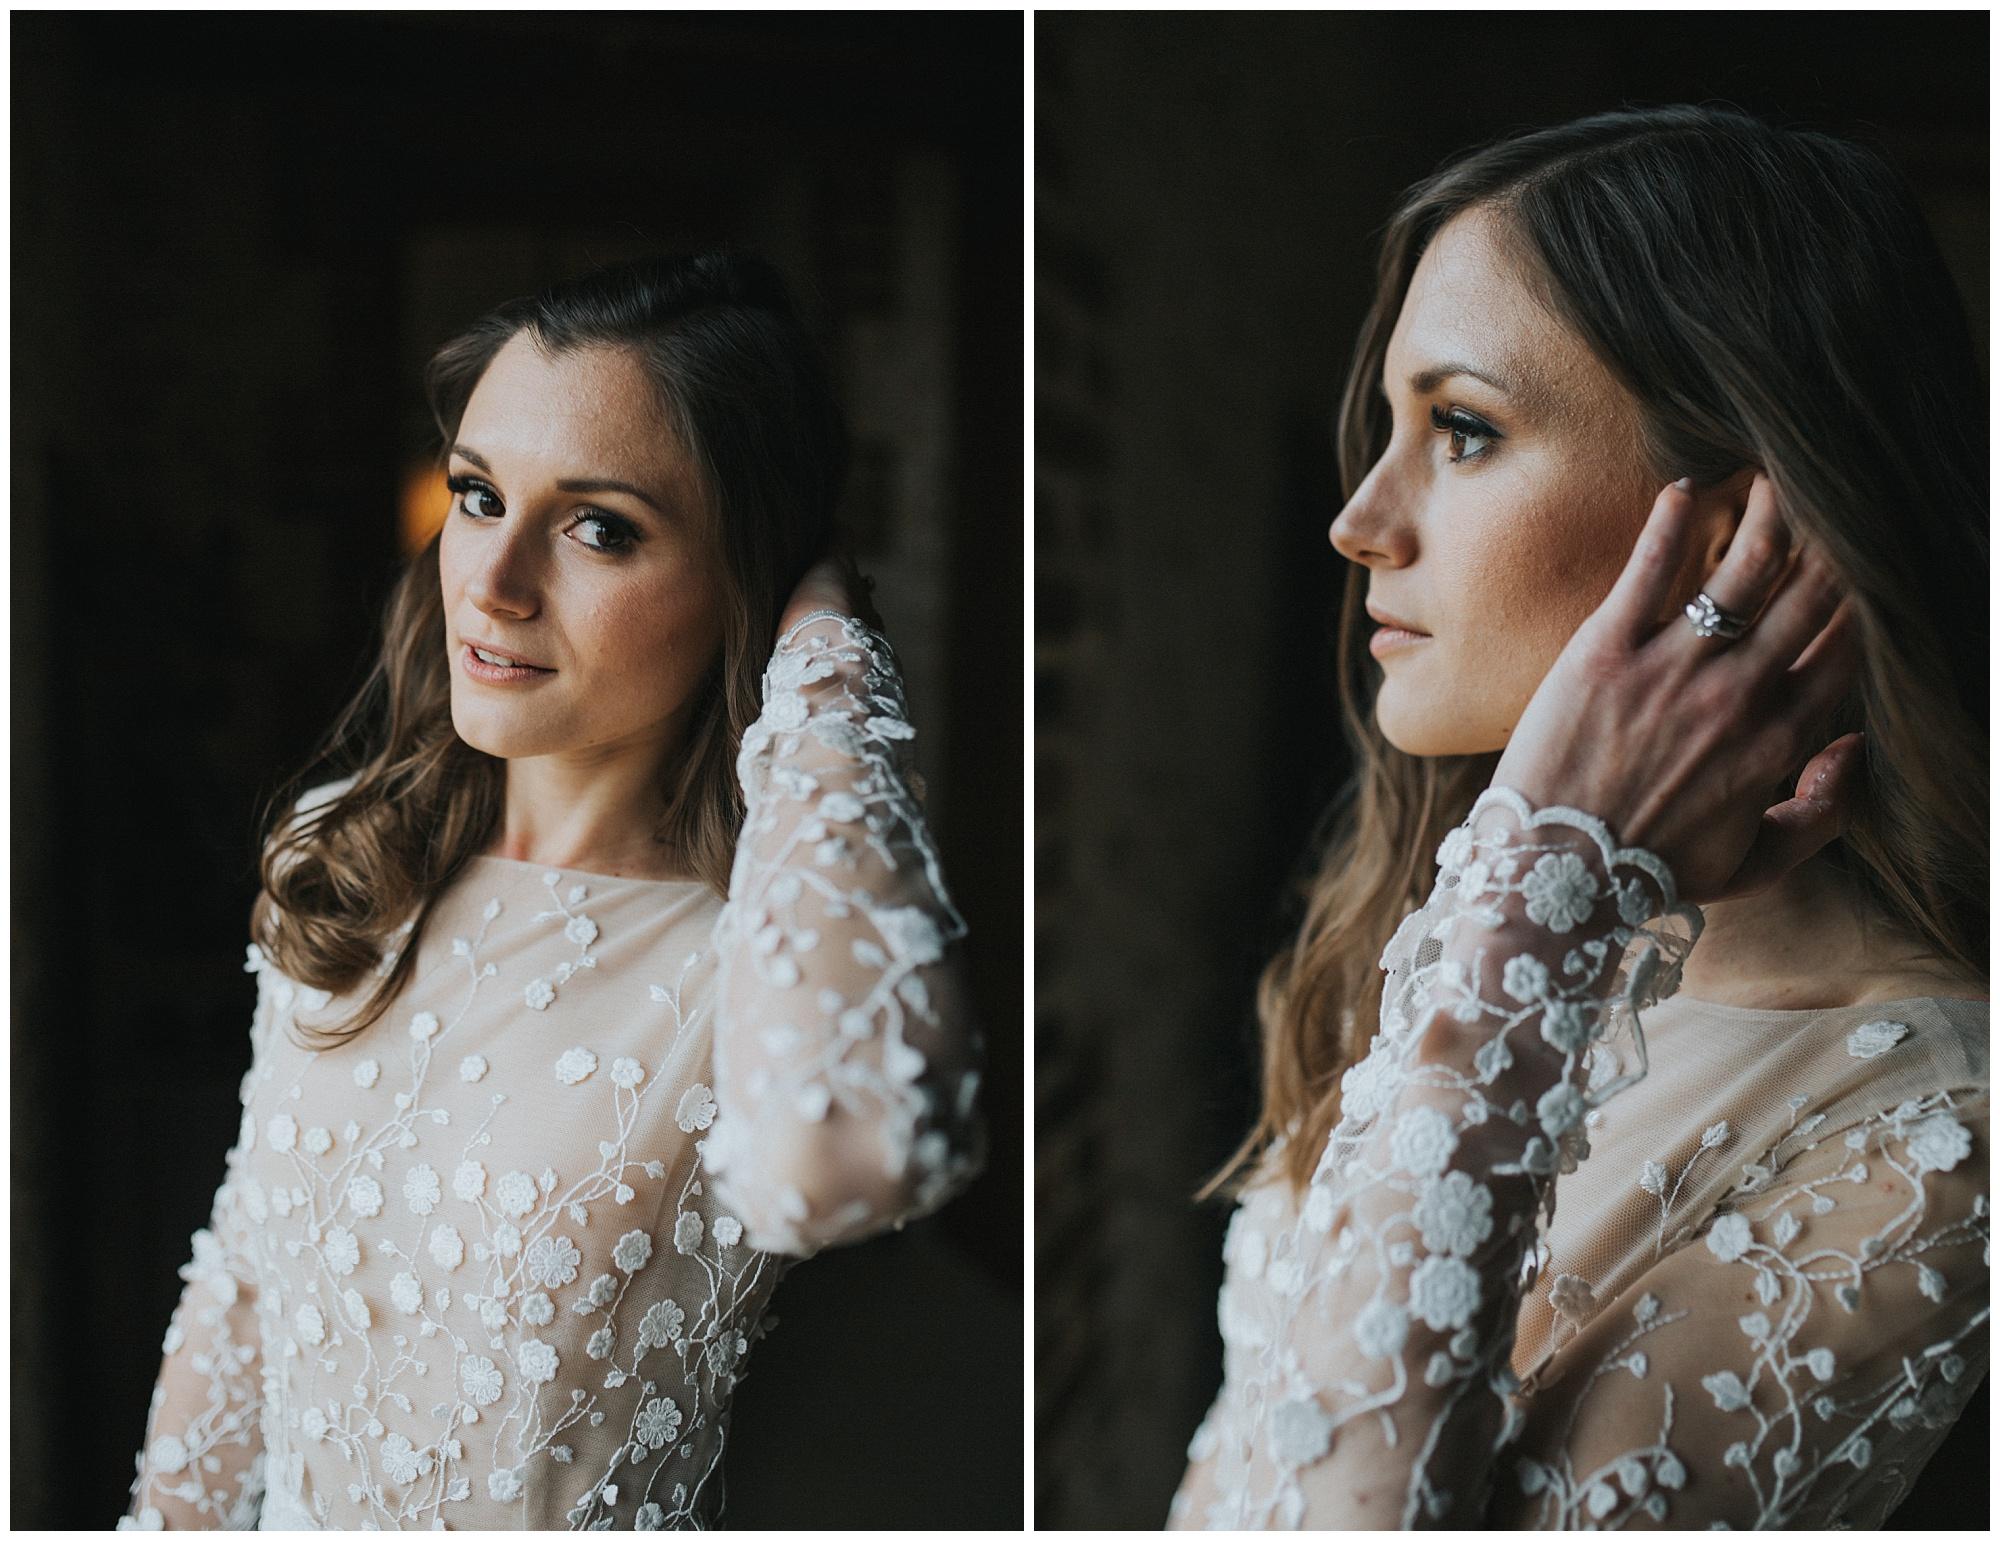 Kateryna-photos-photographer-reims-domaine-des-evis-mariage-normandie-rime-arodaky_0242.jpg